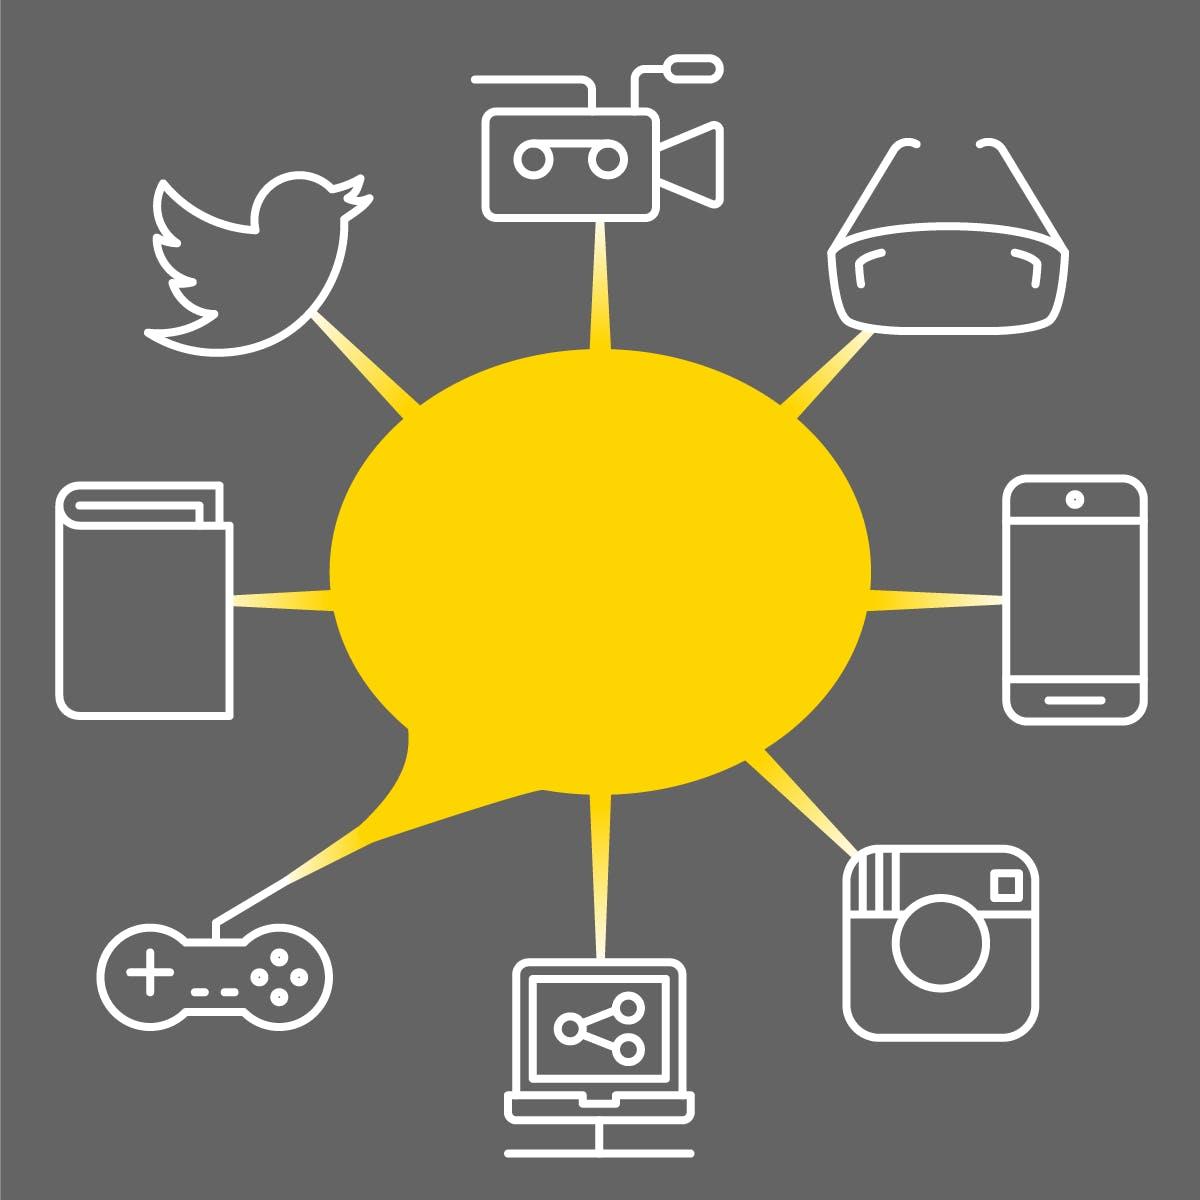 Transmedia Storytelling: Narrative worlds, emerging technologies, and global audiences